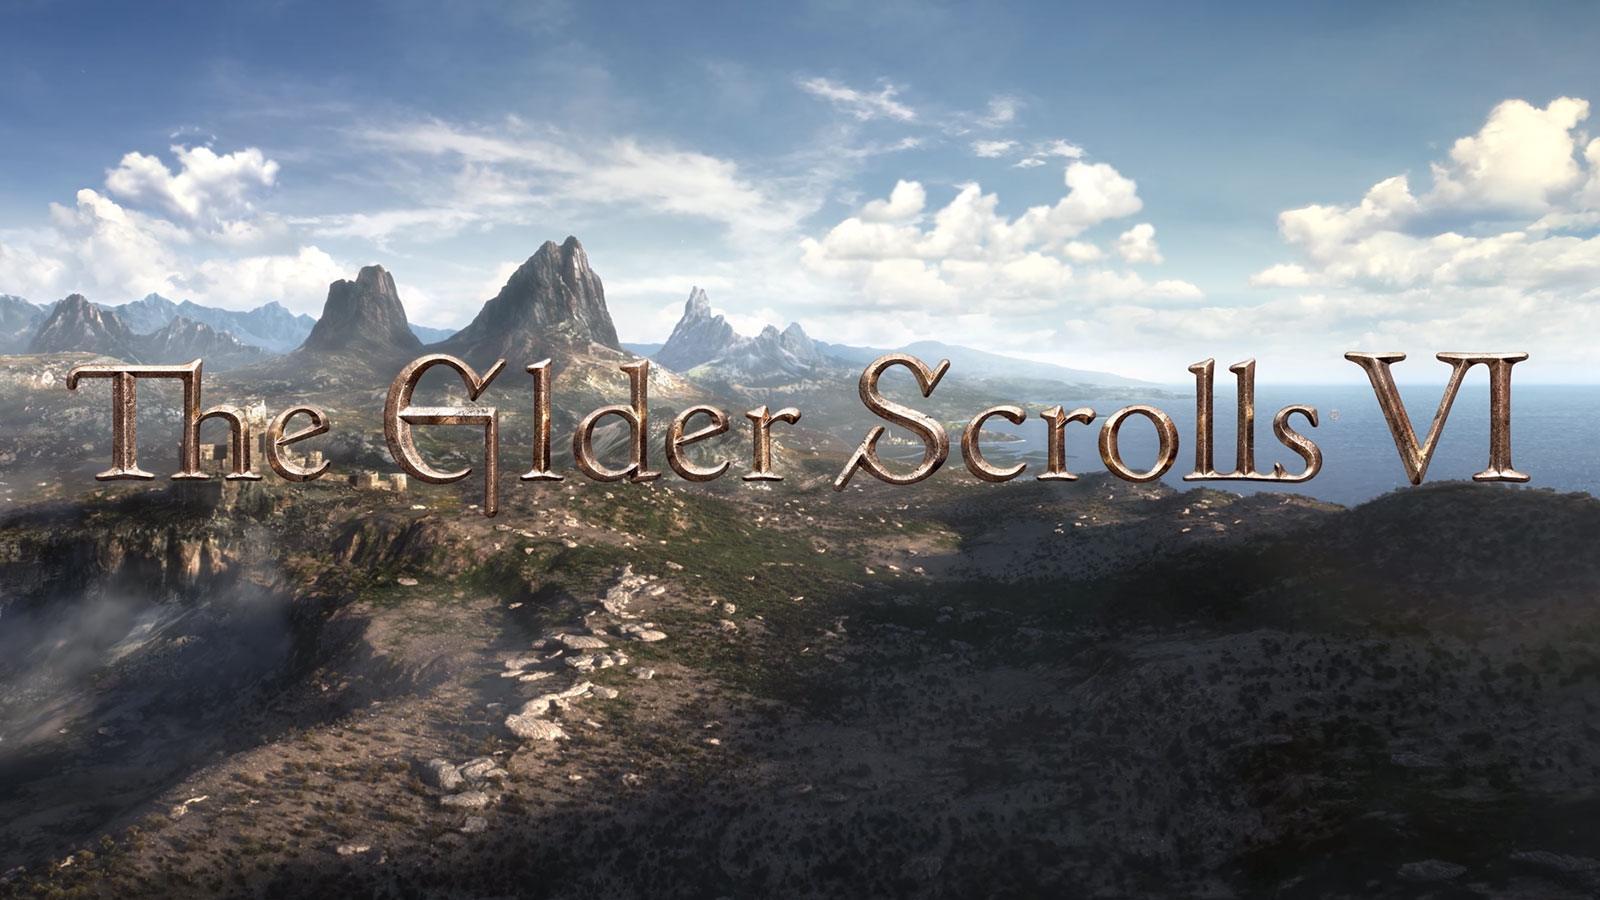 The Elder Scrolls VI Bethesda